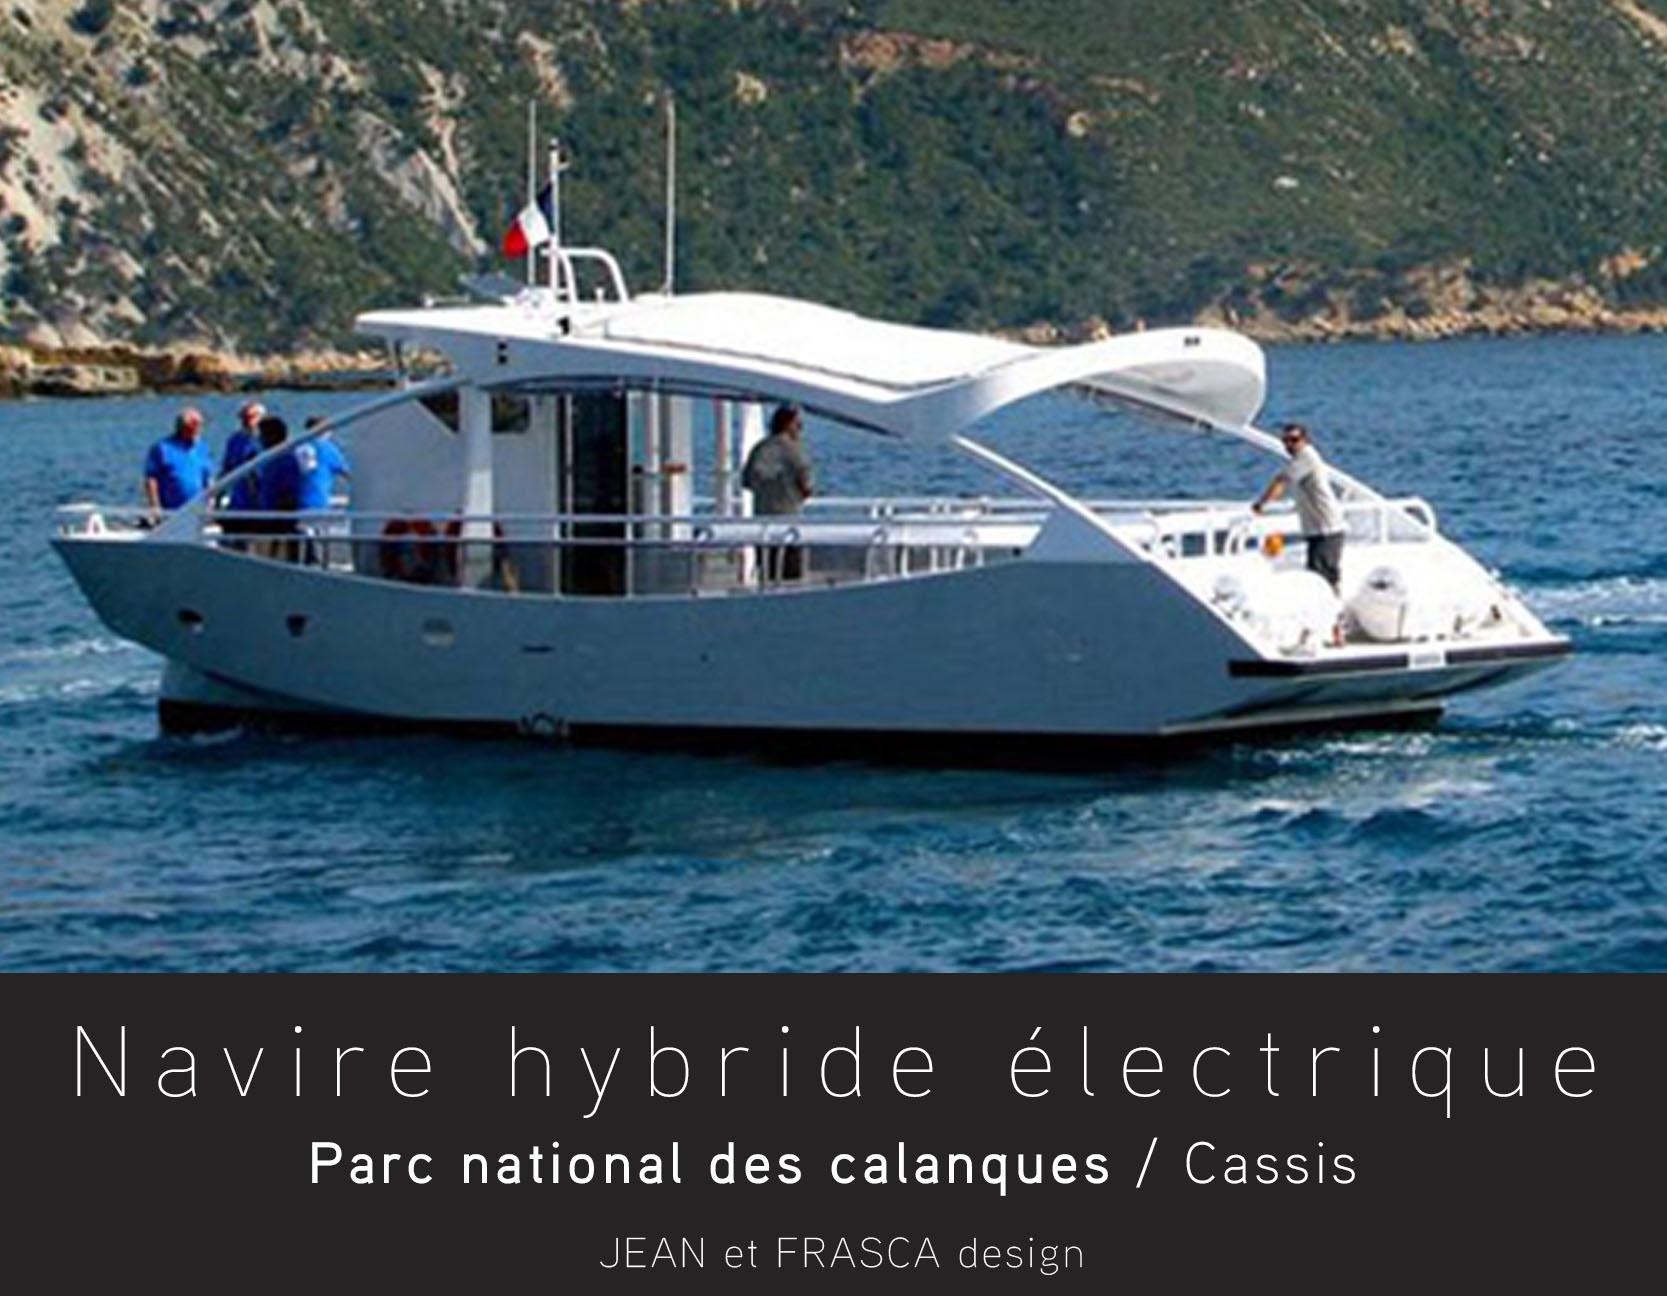 Marseille-Cassis calanques visit